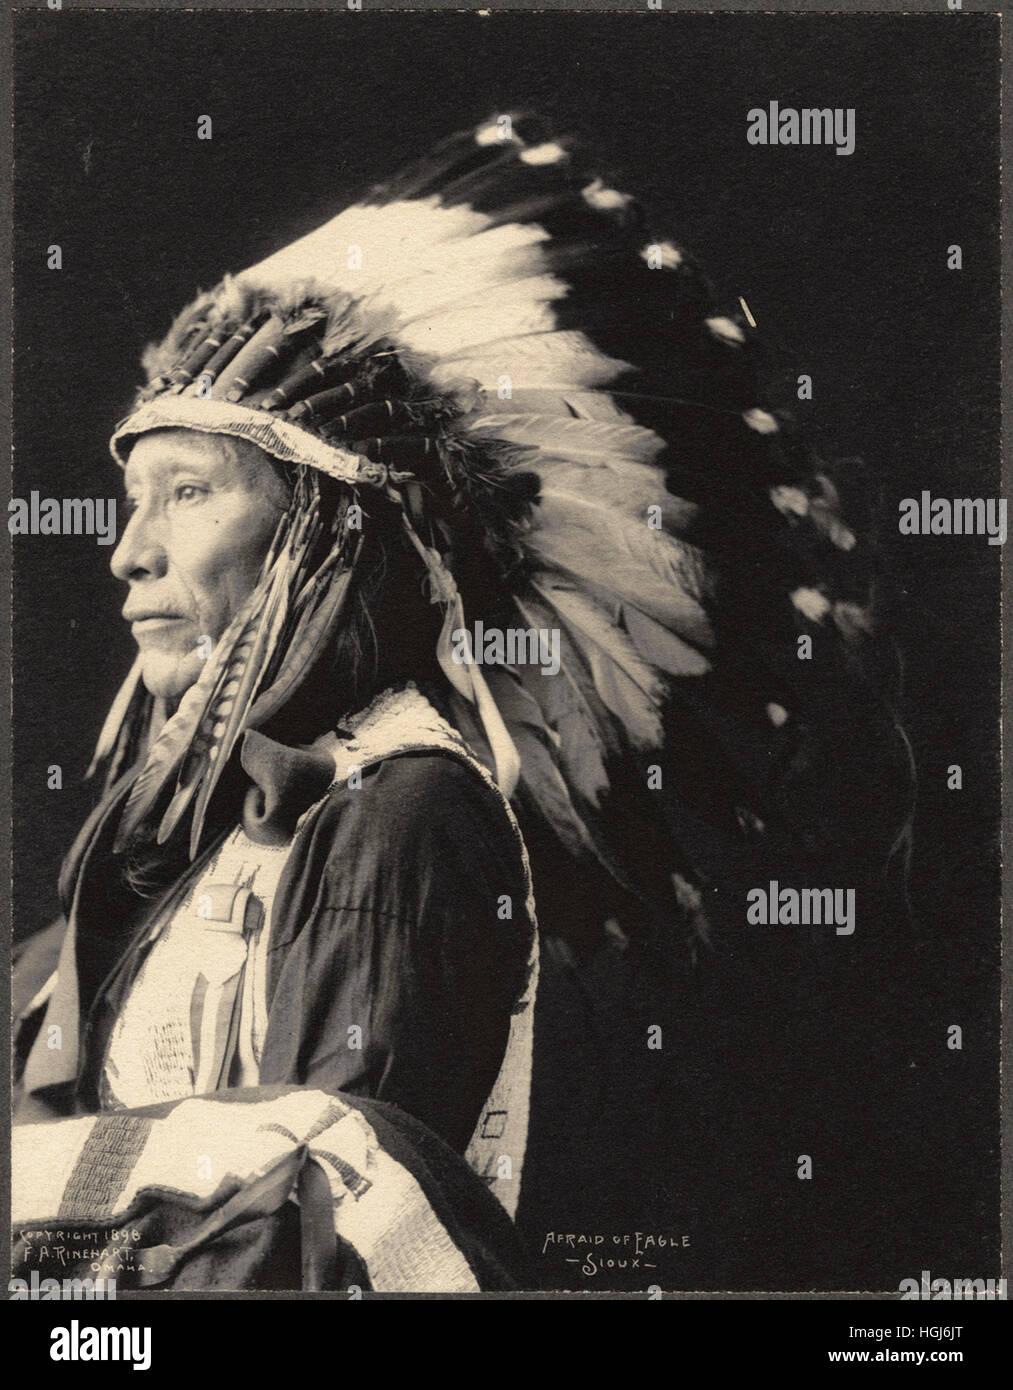 Afraid of Eagle, Sioux   - 1898 Indian Congress - Photo : Frank A. Rinehart - Stock Image